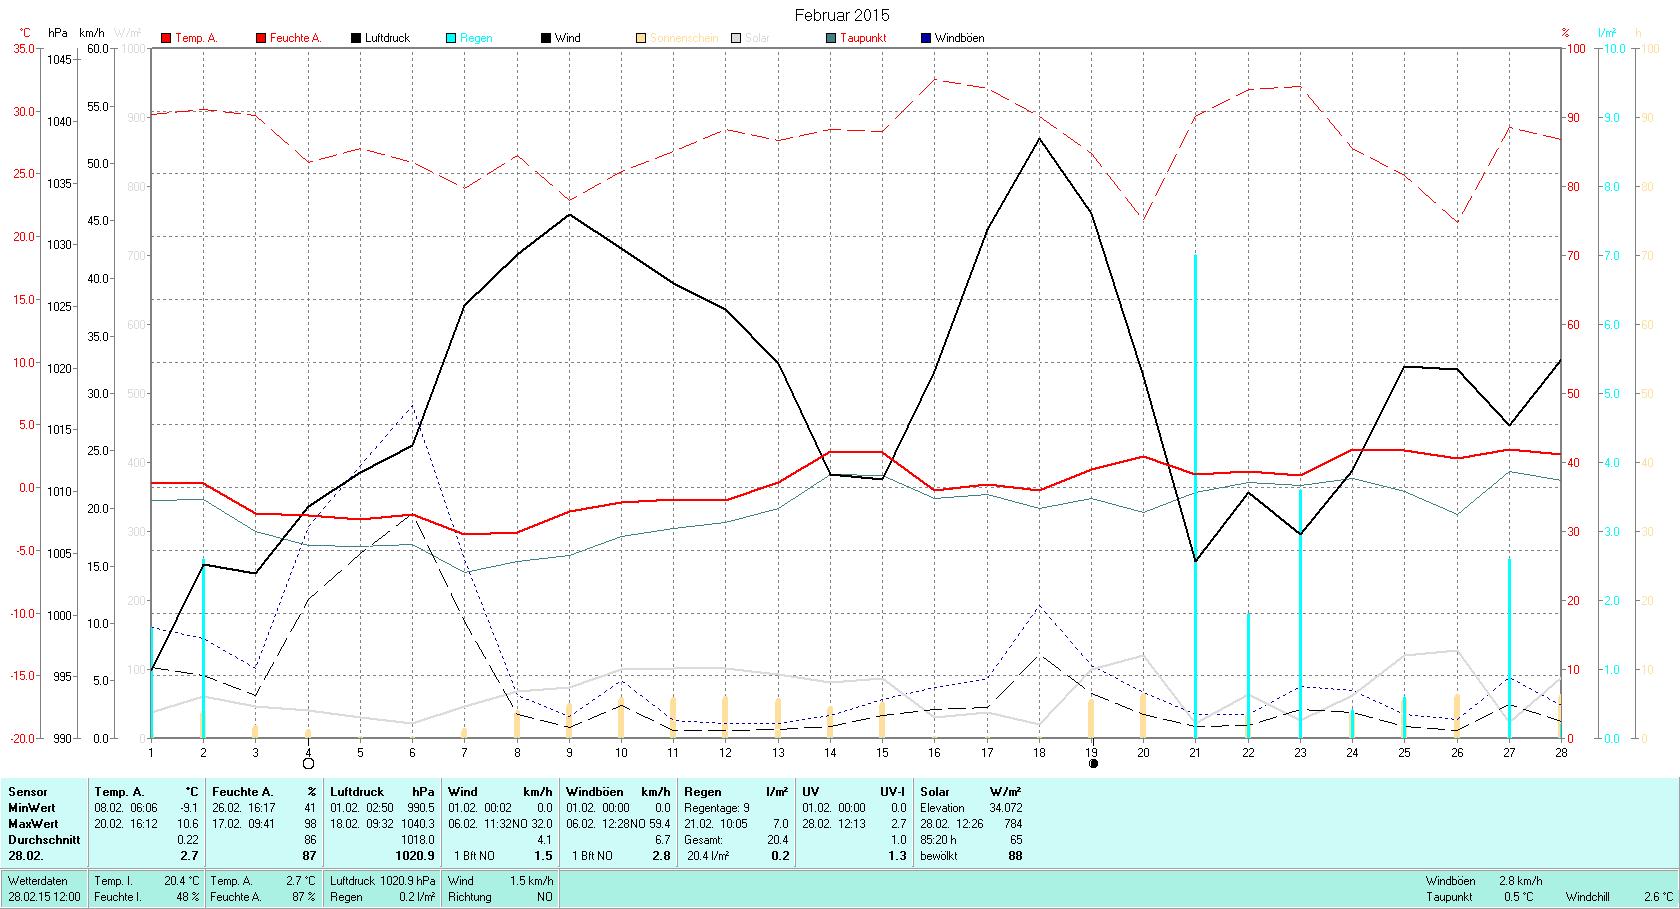 Februar 2015 Tmin -9.1°C, Tmax 10.6°C, Sonne 85:20h, Niederschlag 20.4mm/2